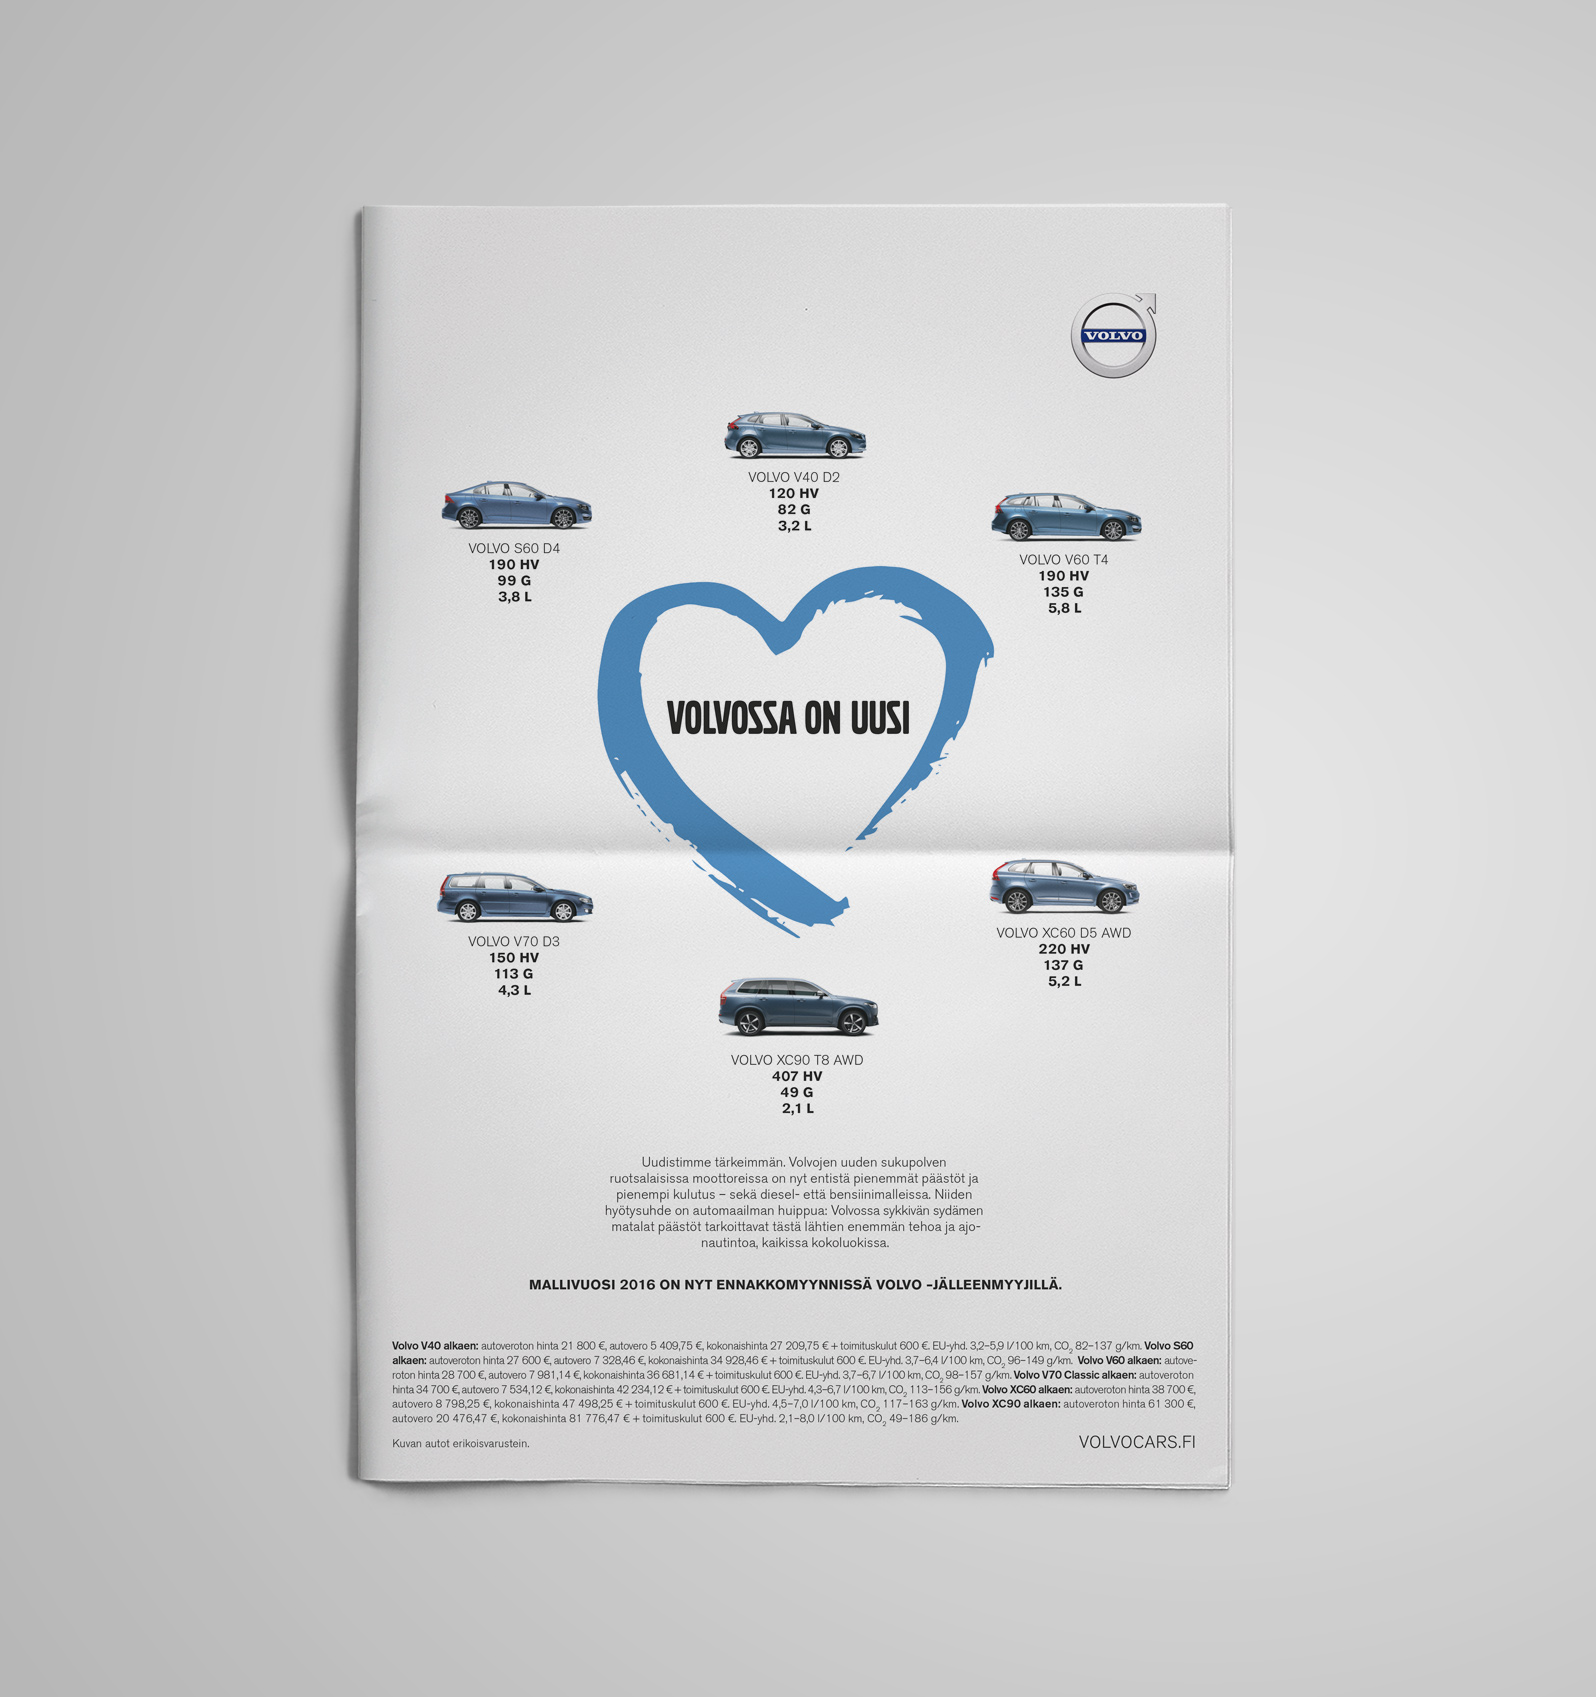 Volvo MY16 launch newspaper